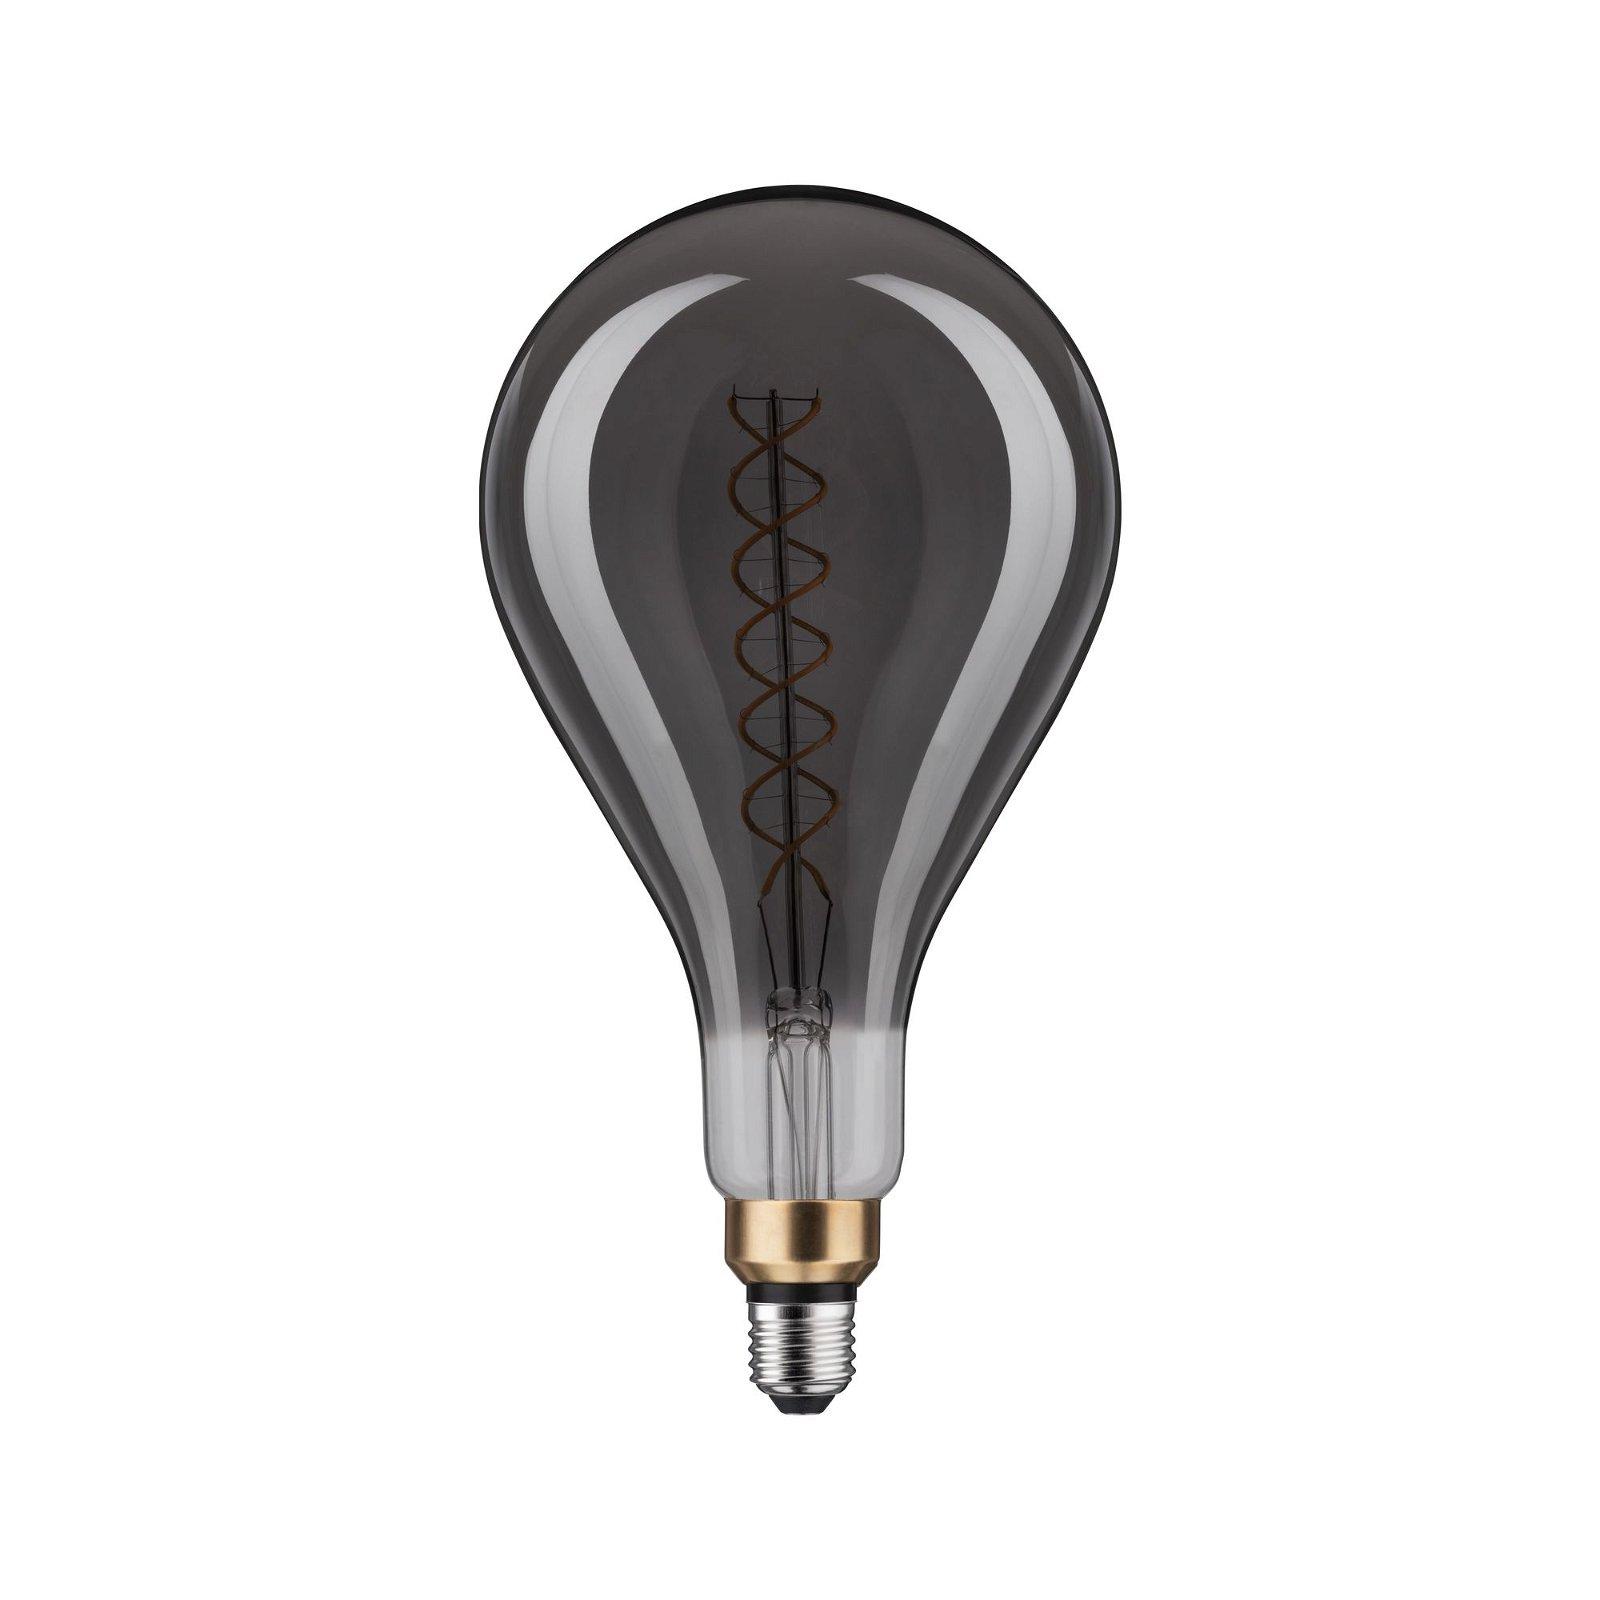 1879 LED BigDrop E27 230V 300lm 7W 2700K Rauchglas